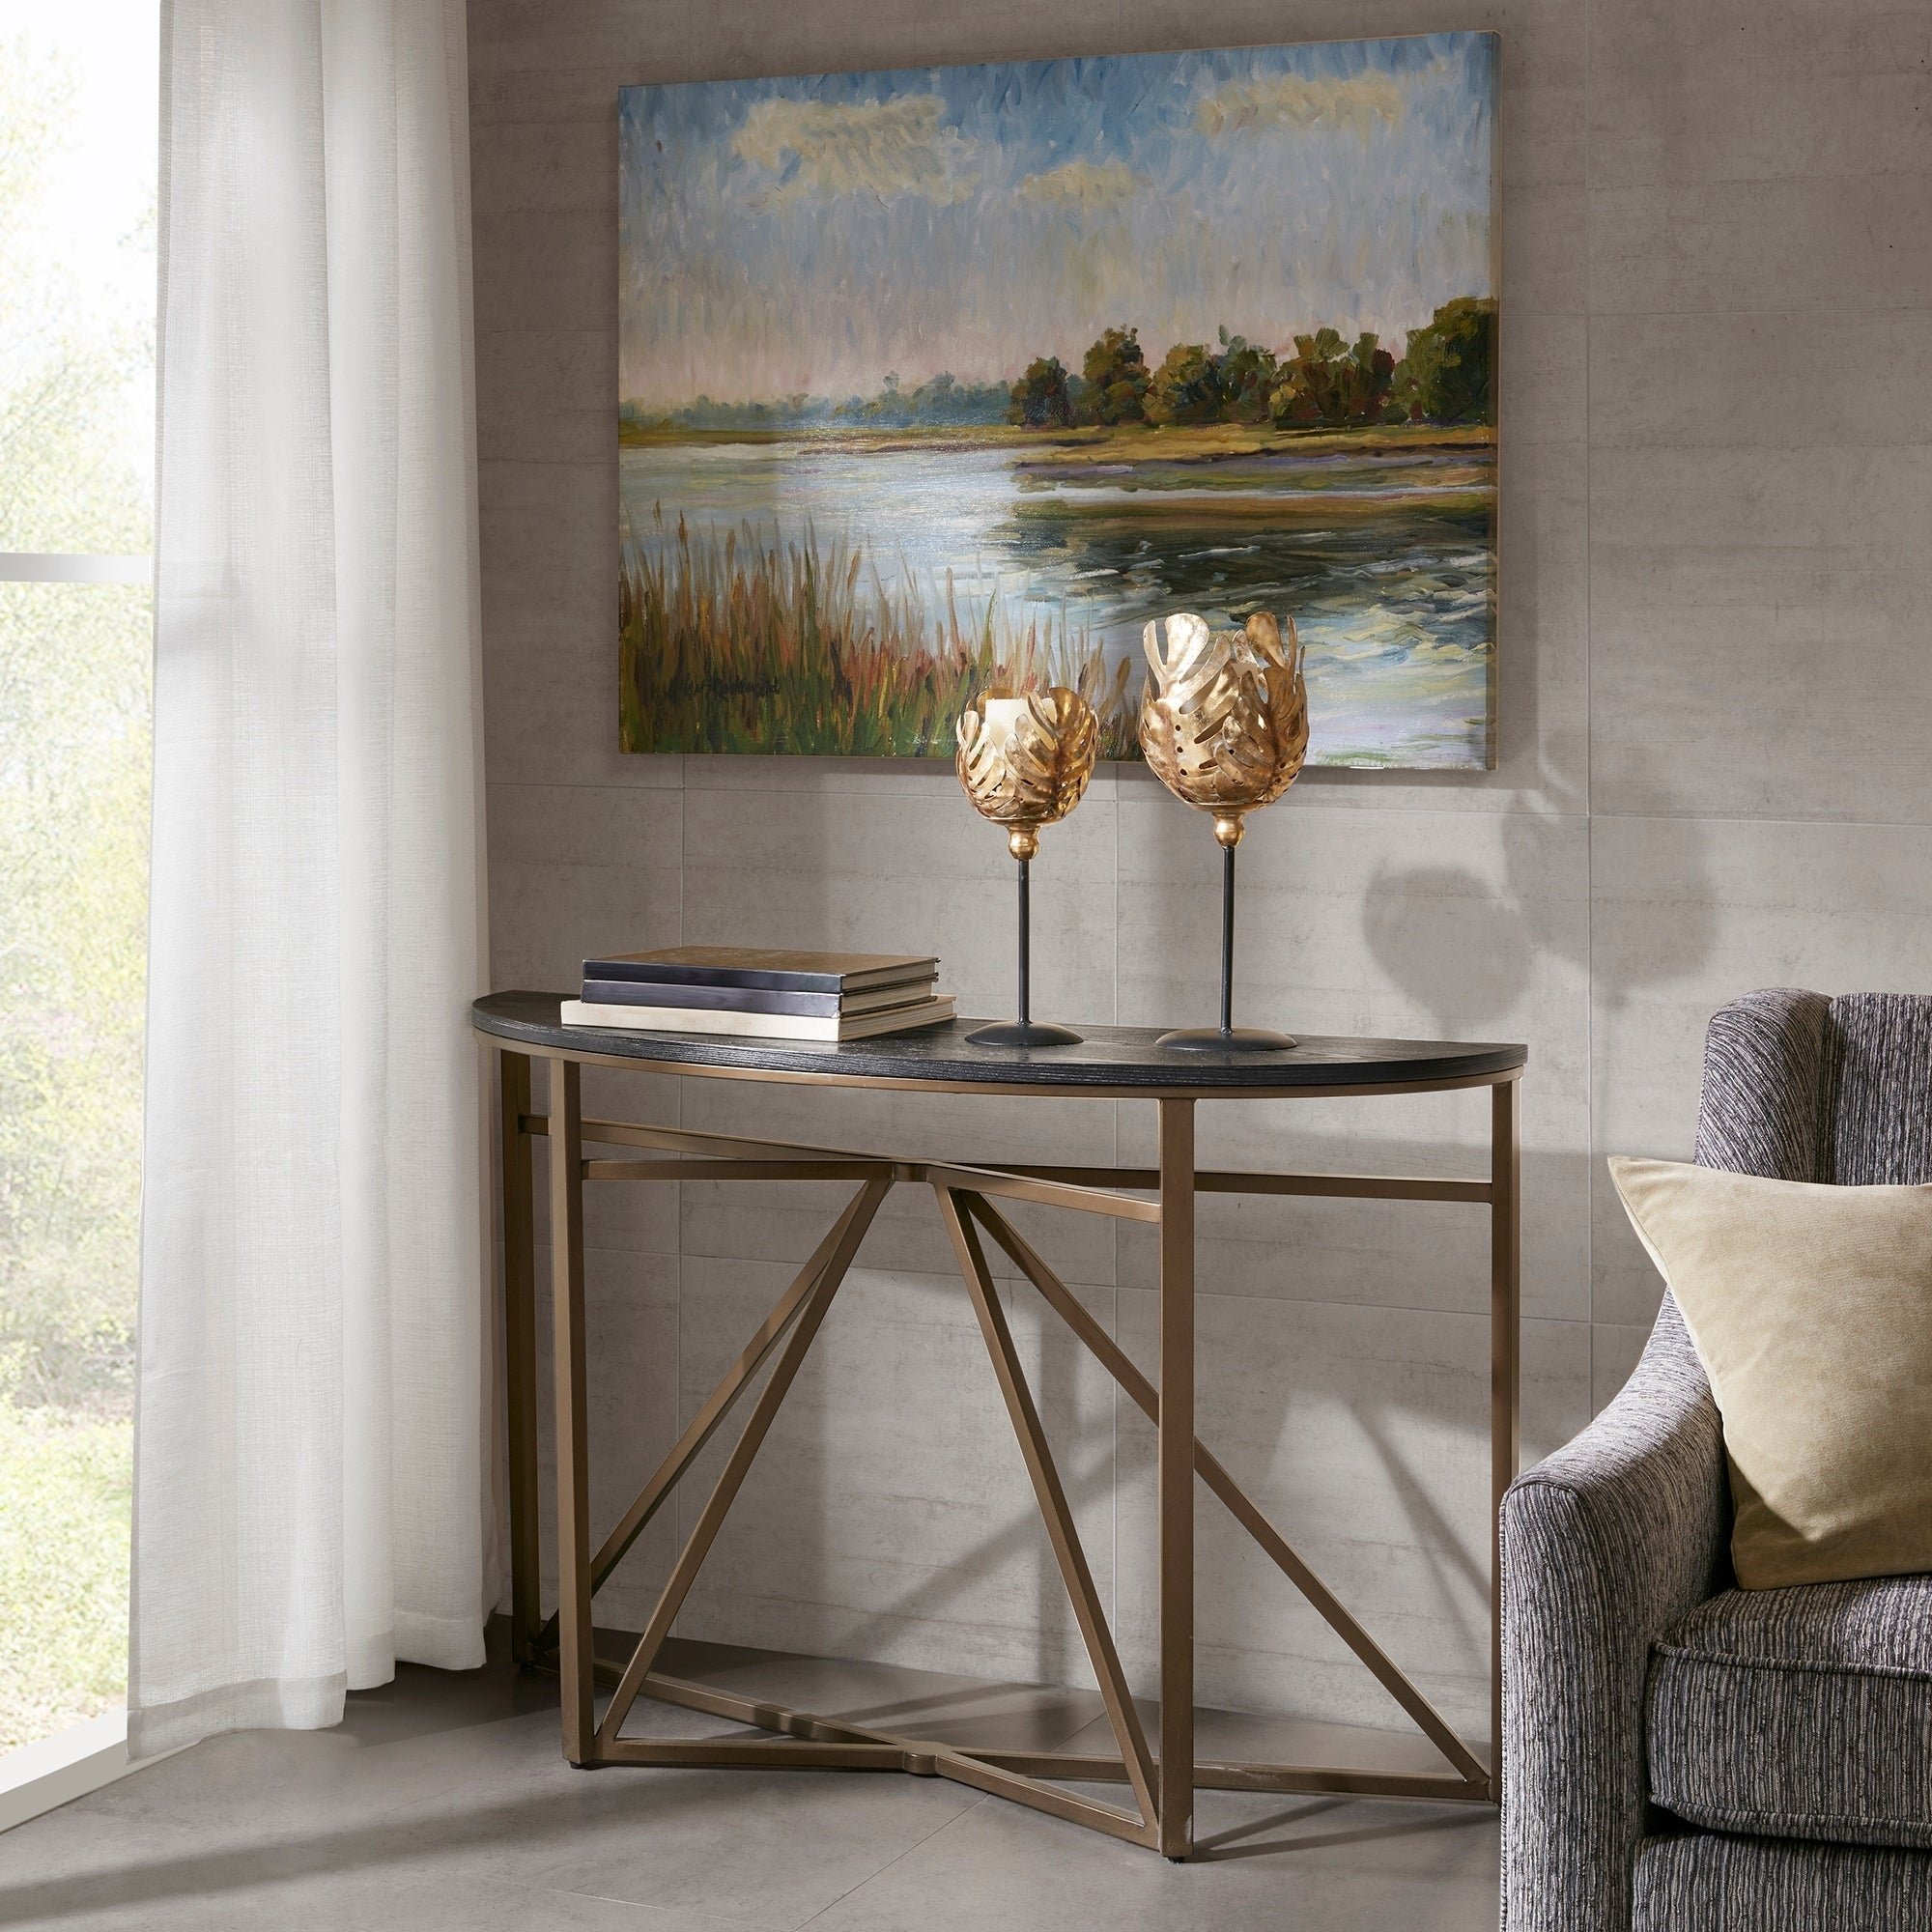 Sensational Madison Park Kayden Black Bronze Console Table Ncnpc Chair Design For Home Ncnpcorg